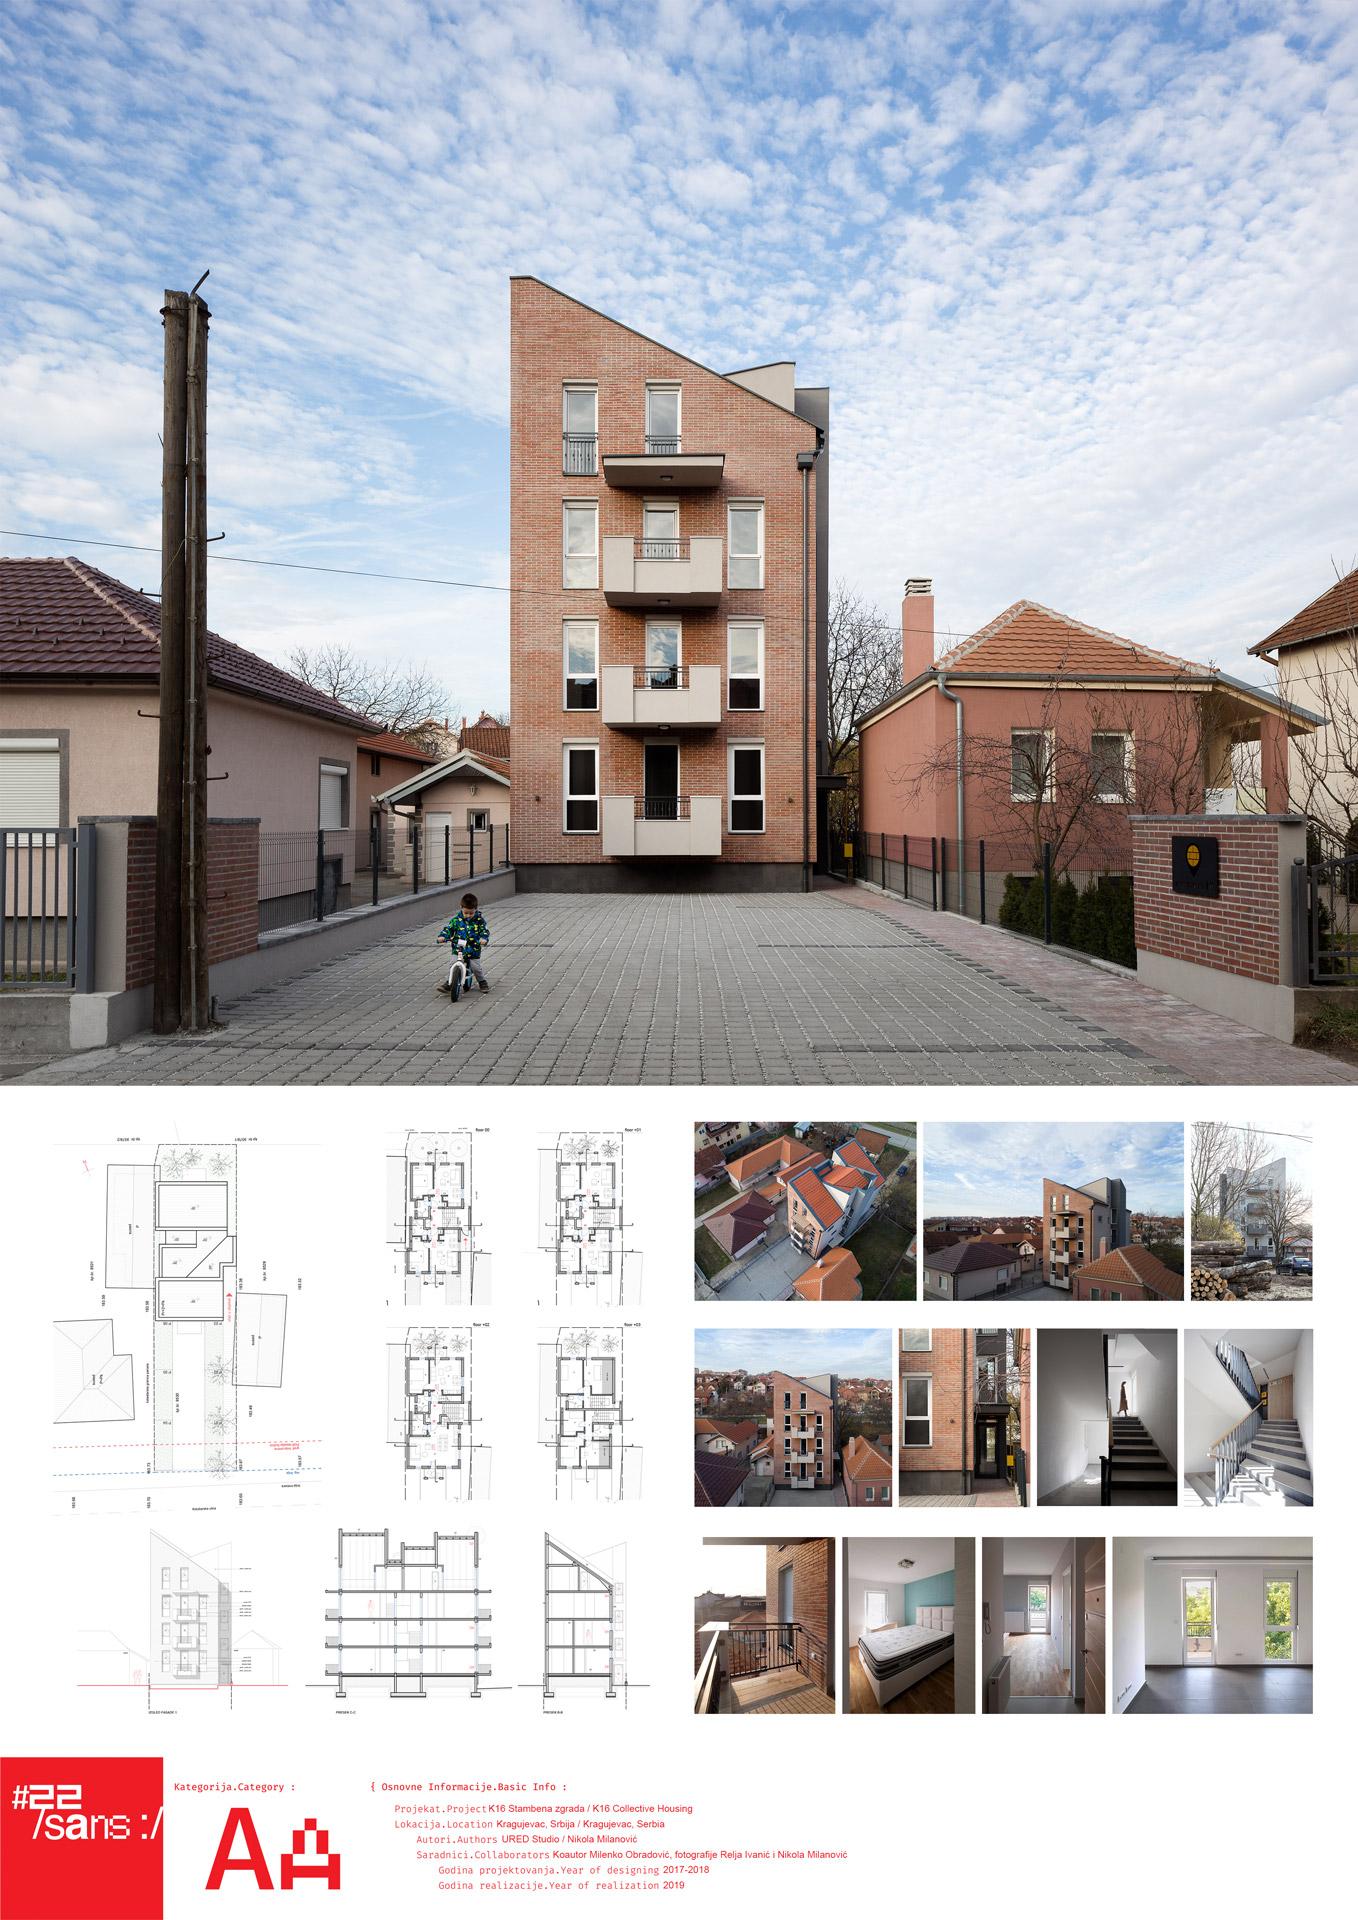 "<p class=""naslov-br"">aa41</p>K16 Kolektivno stanovanje // K16 Collective housing"